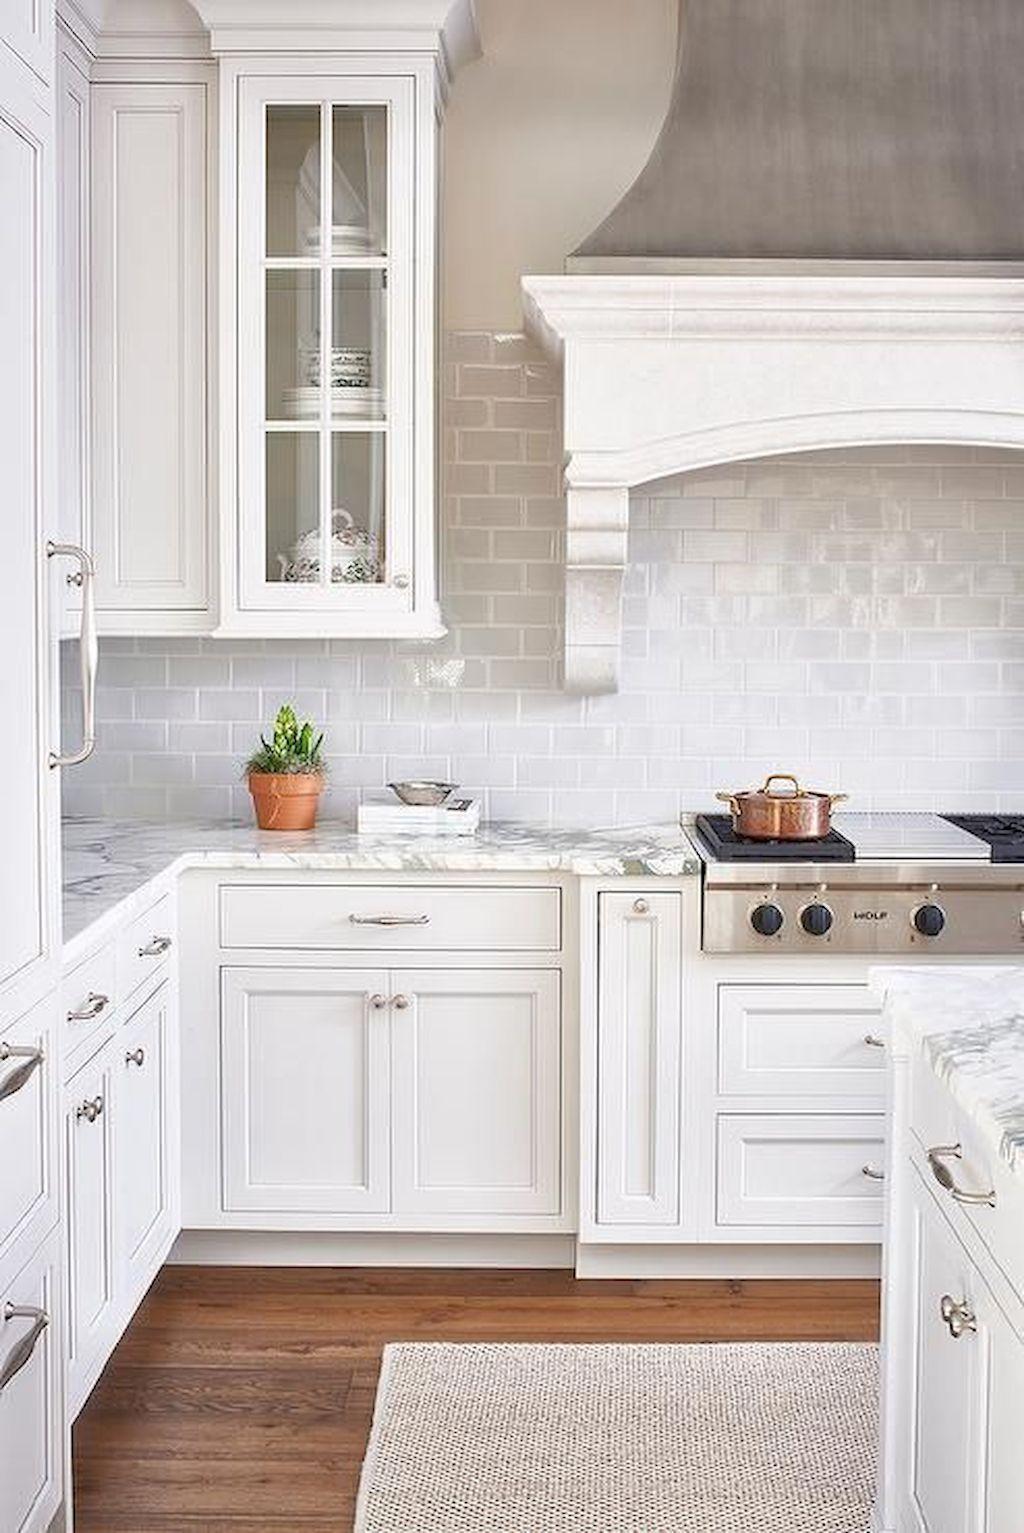 13 beautiful white kitchen cabinet design ideas | Cabinet design ...